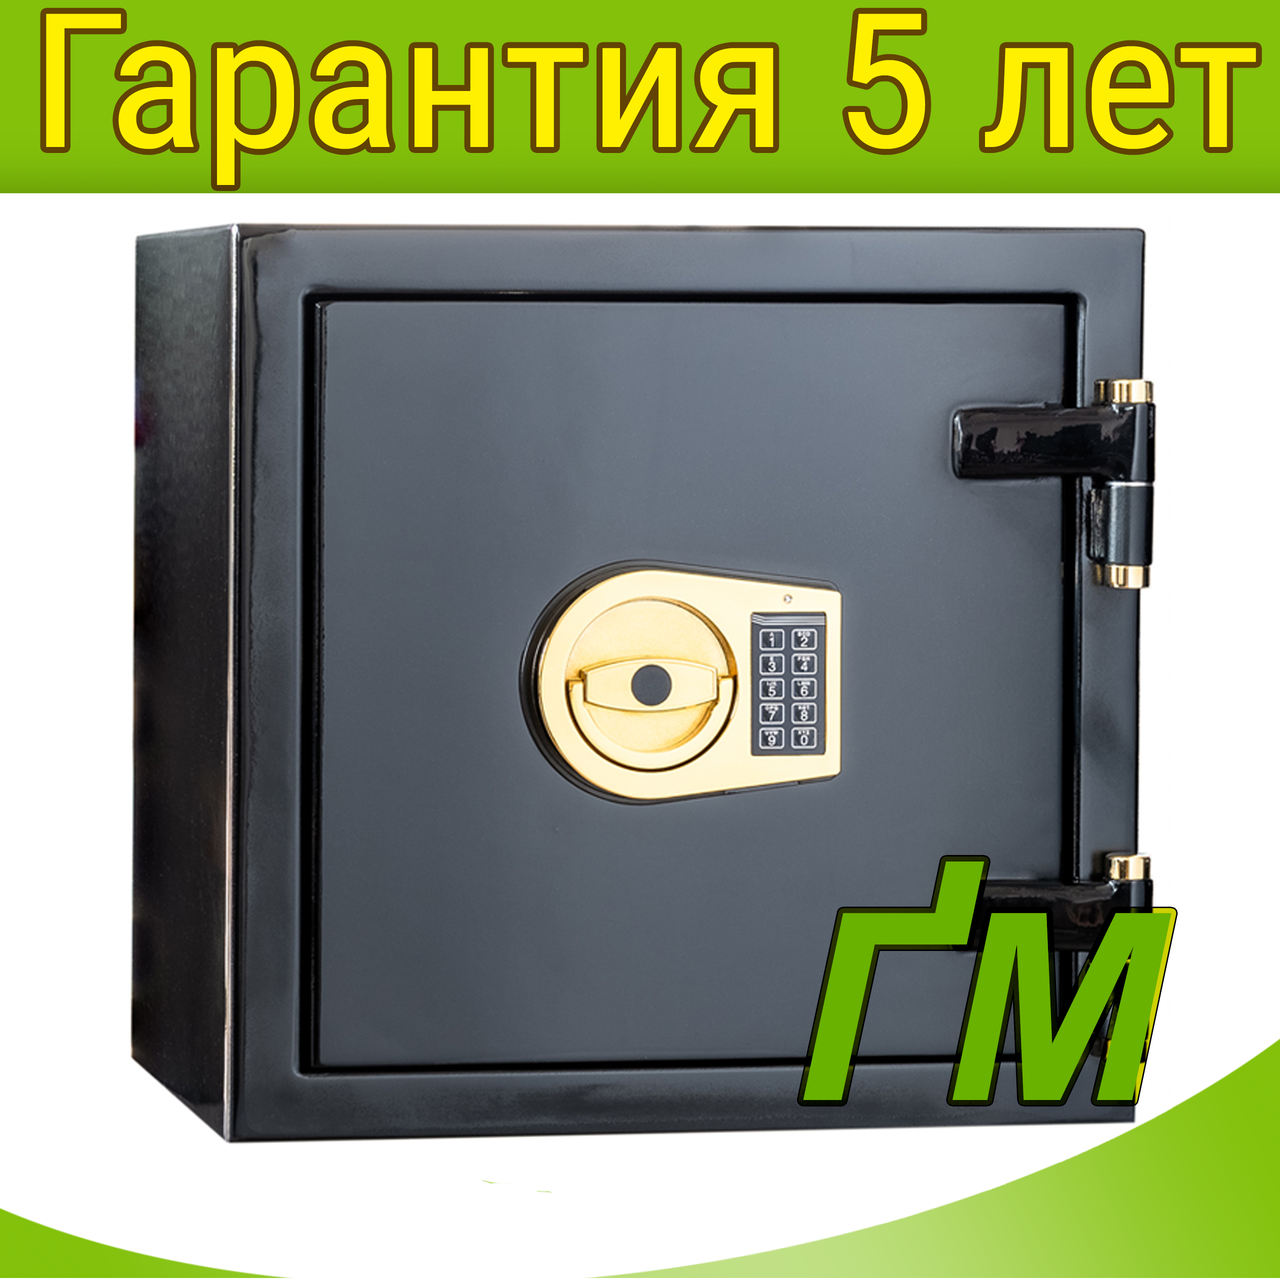 Сейф огневзломостойкий F.30CLI.35.E BLACK GOLD (350х395х395мм)